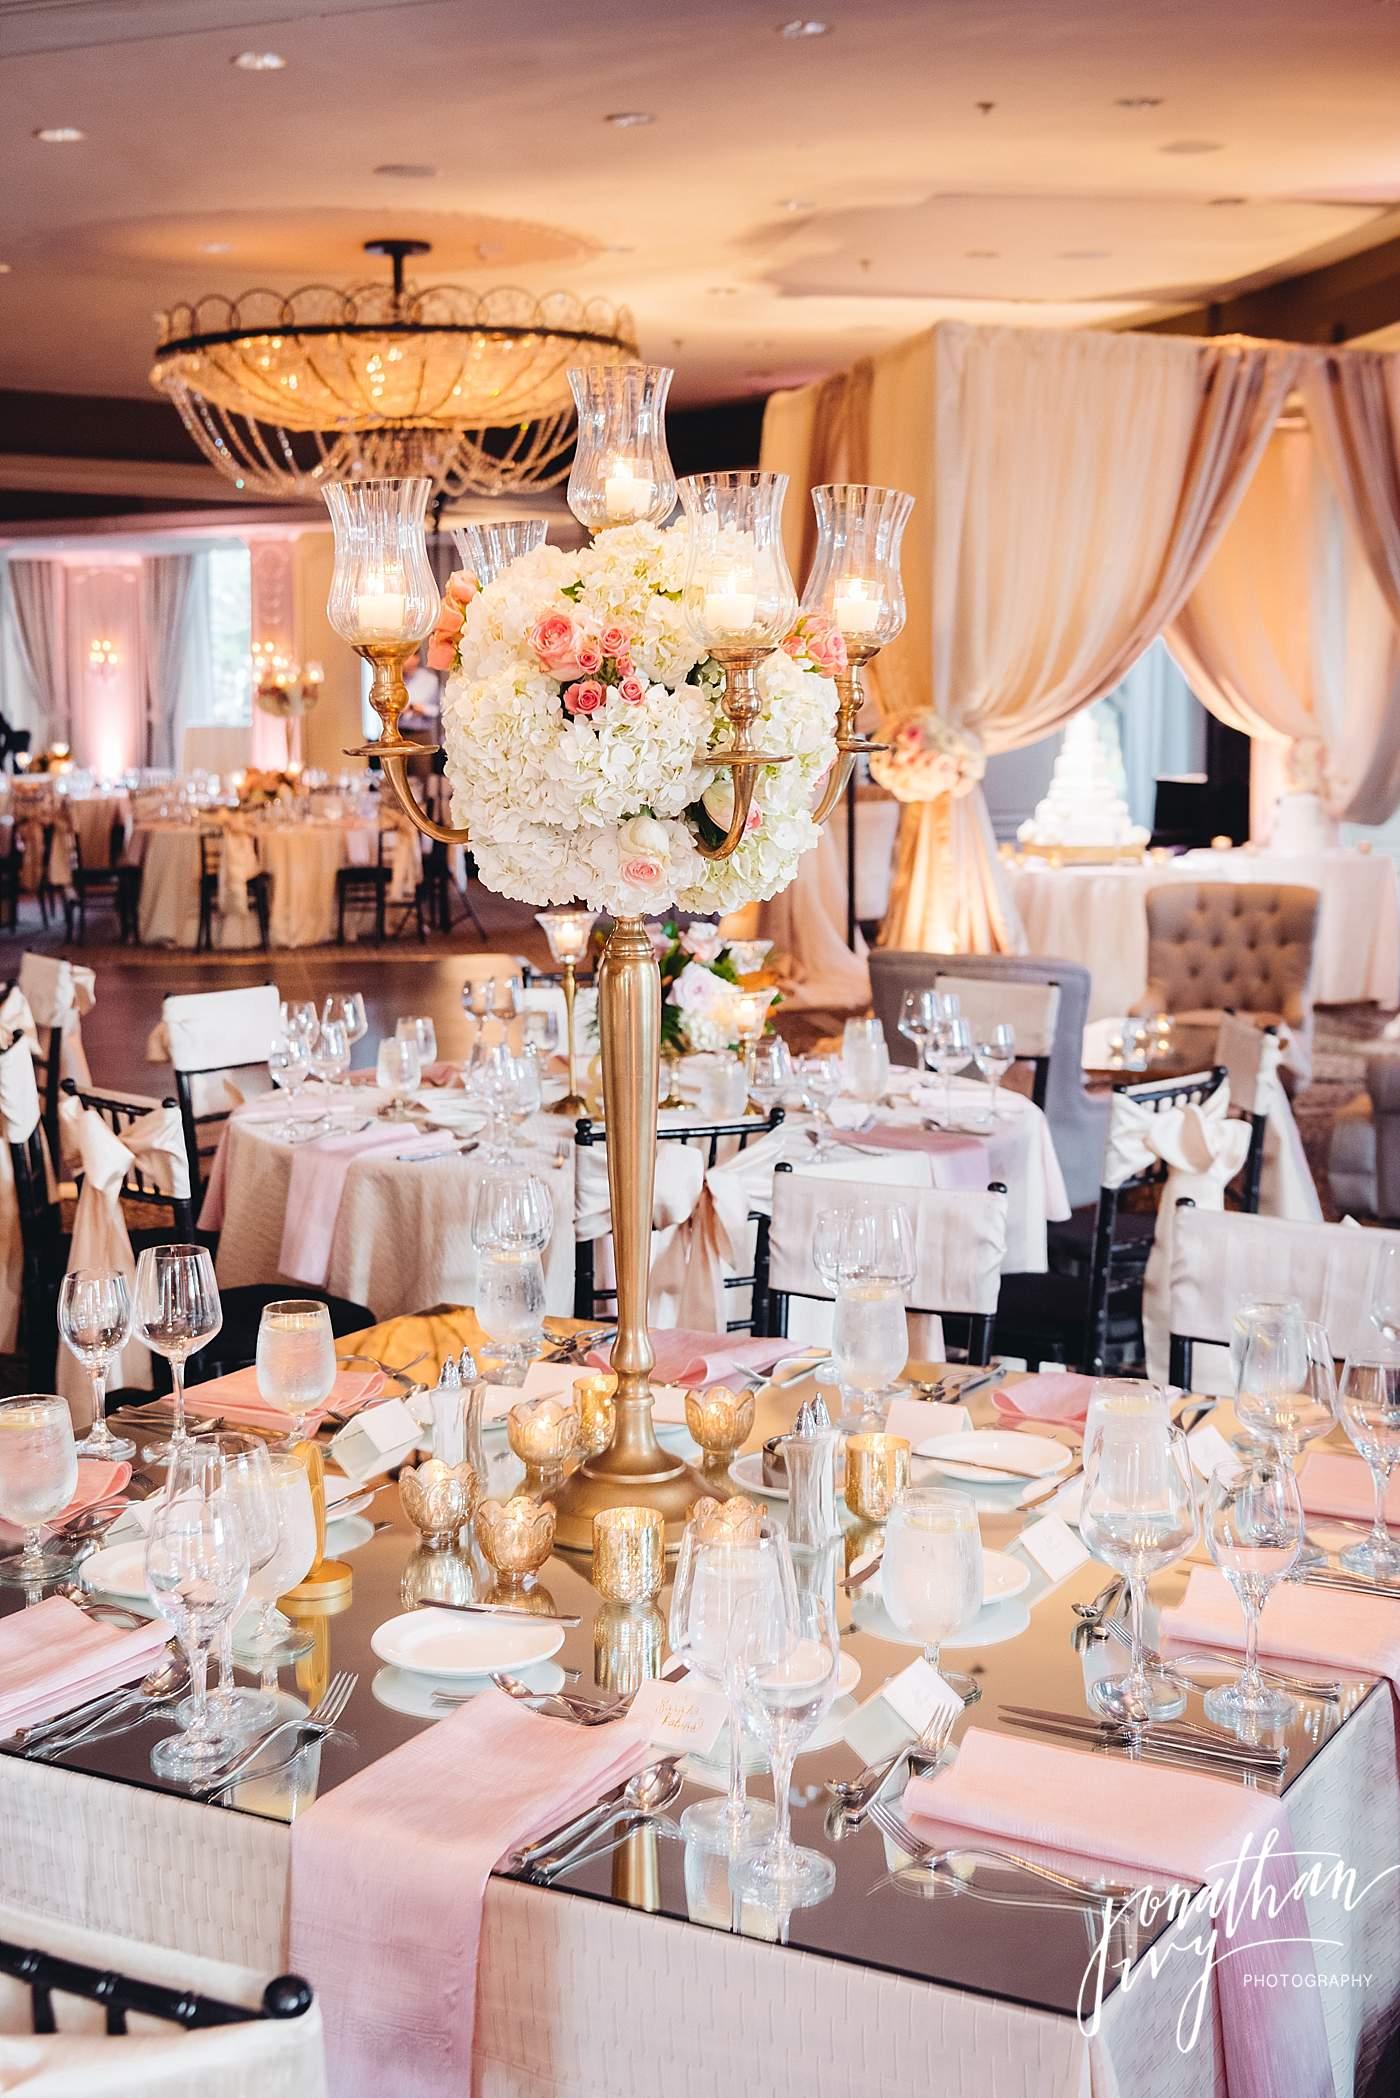 Hotel Zaza Houston Weddings,Hotel Zaza Wedding,Phantom Ballroom,Phantom Ballroom Reception,AJ Urban Petals